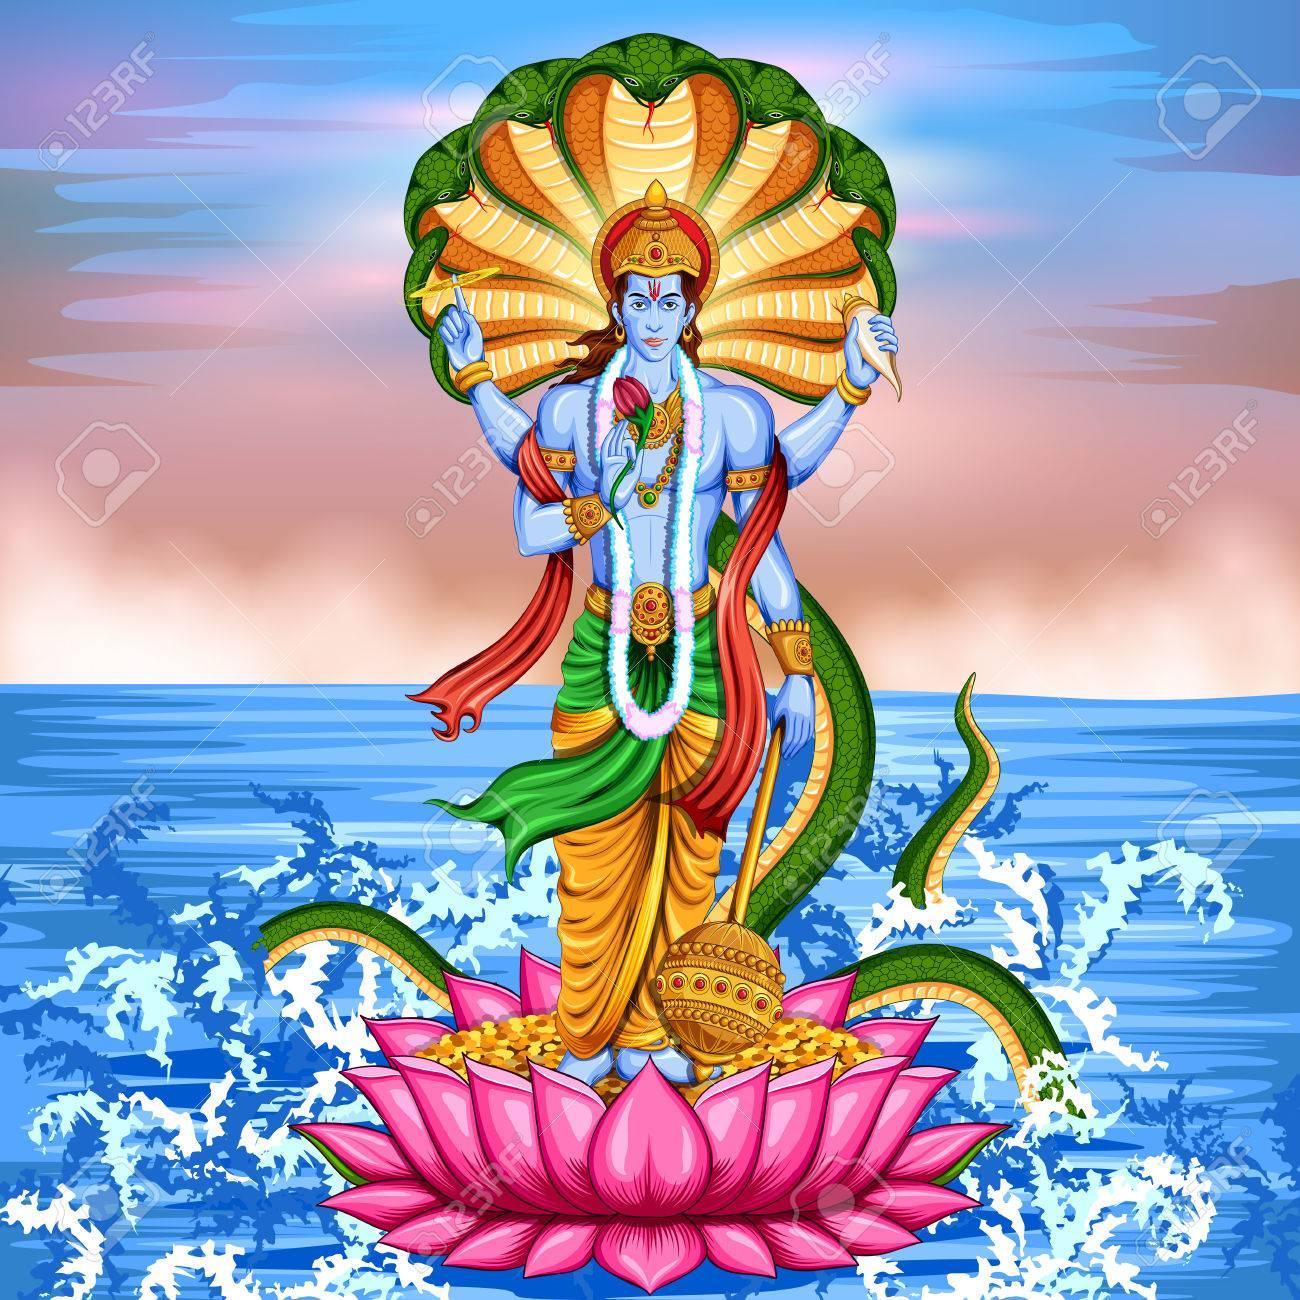 Lord Vishnu standing on lotus giving blessing - 76584849